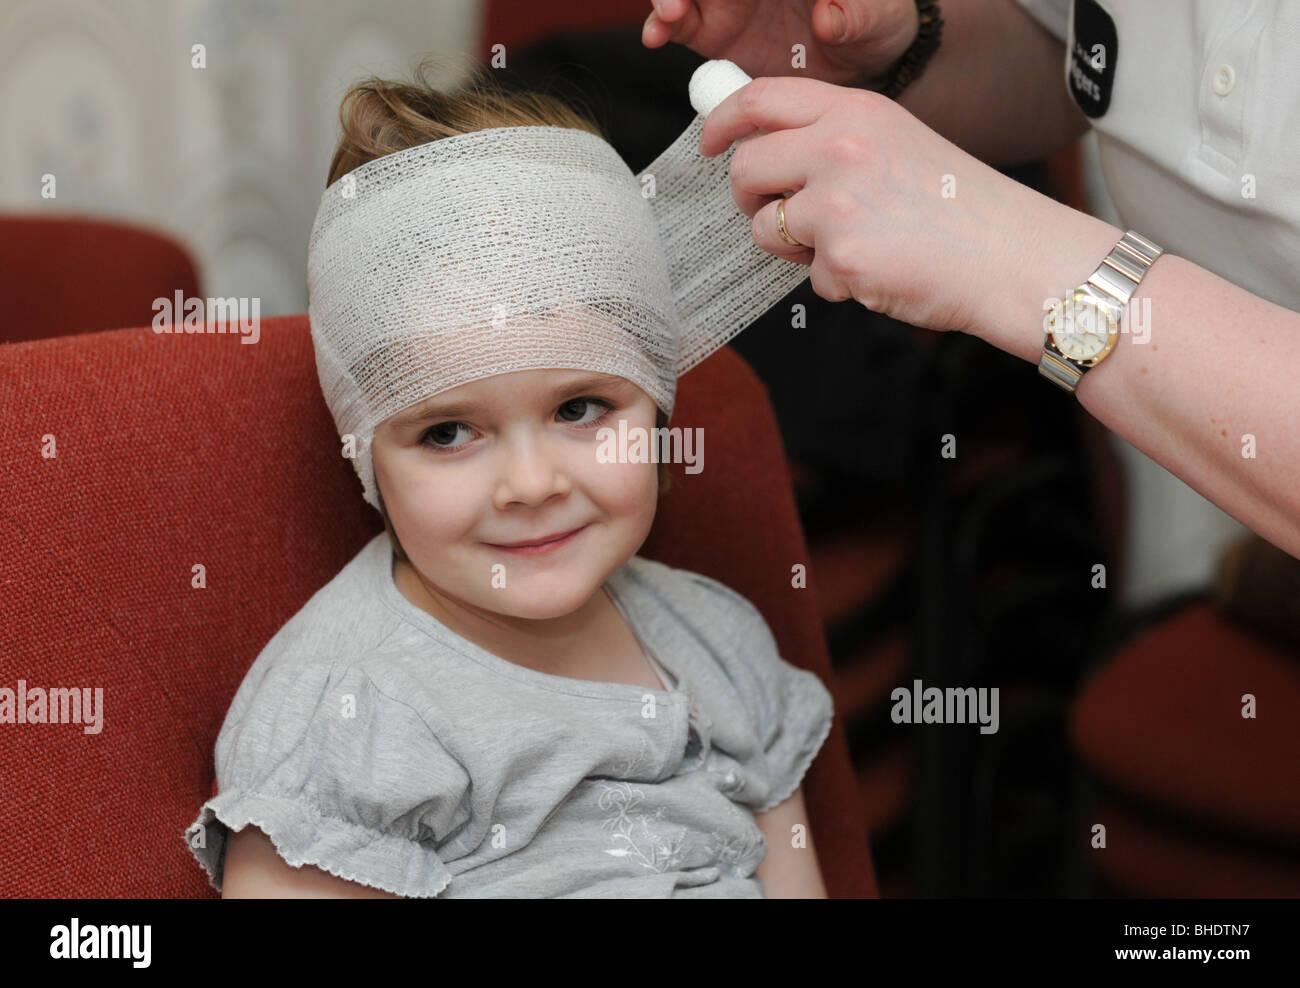 Head Injury Stock Photos & Head Injury Stock Images - Alamy